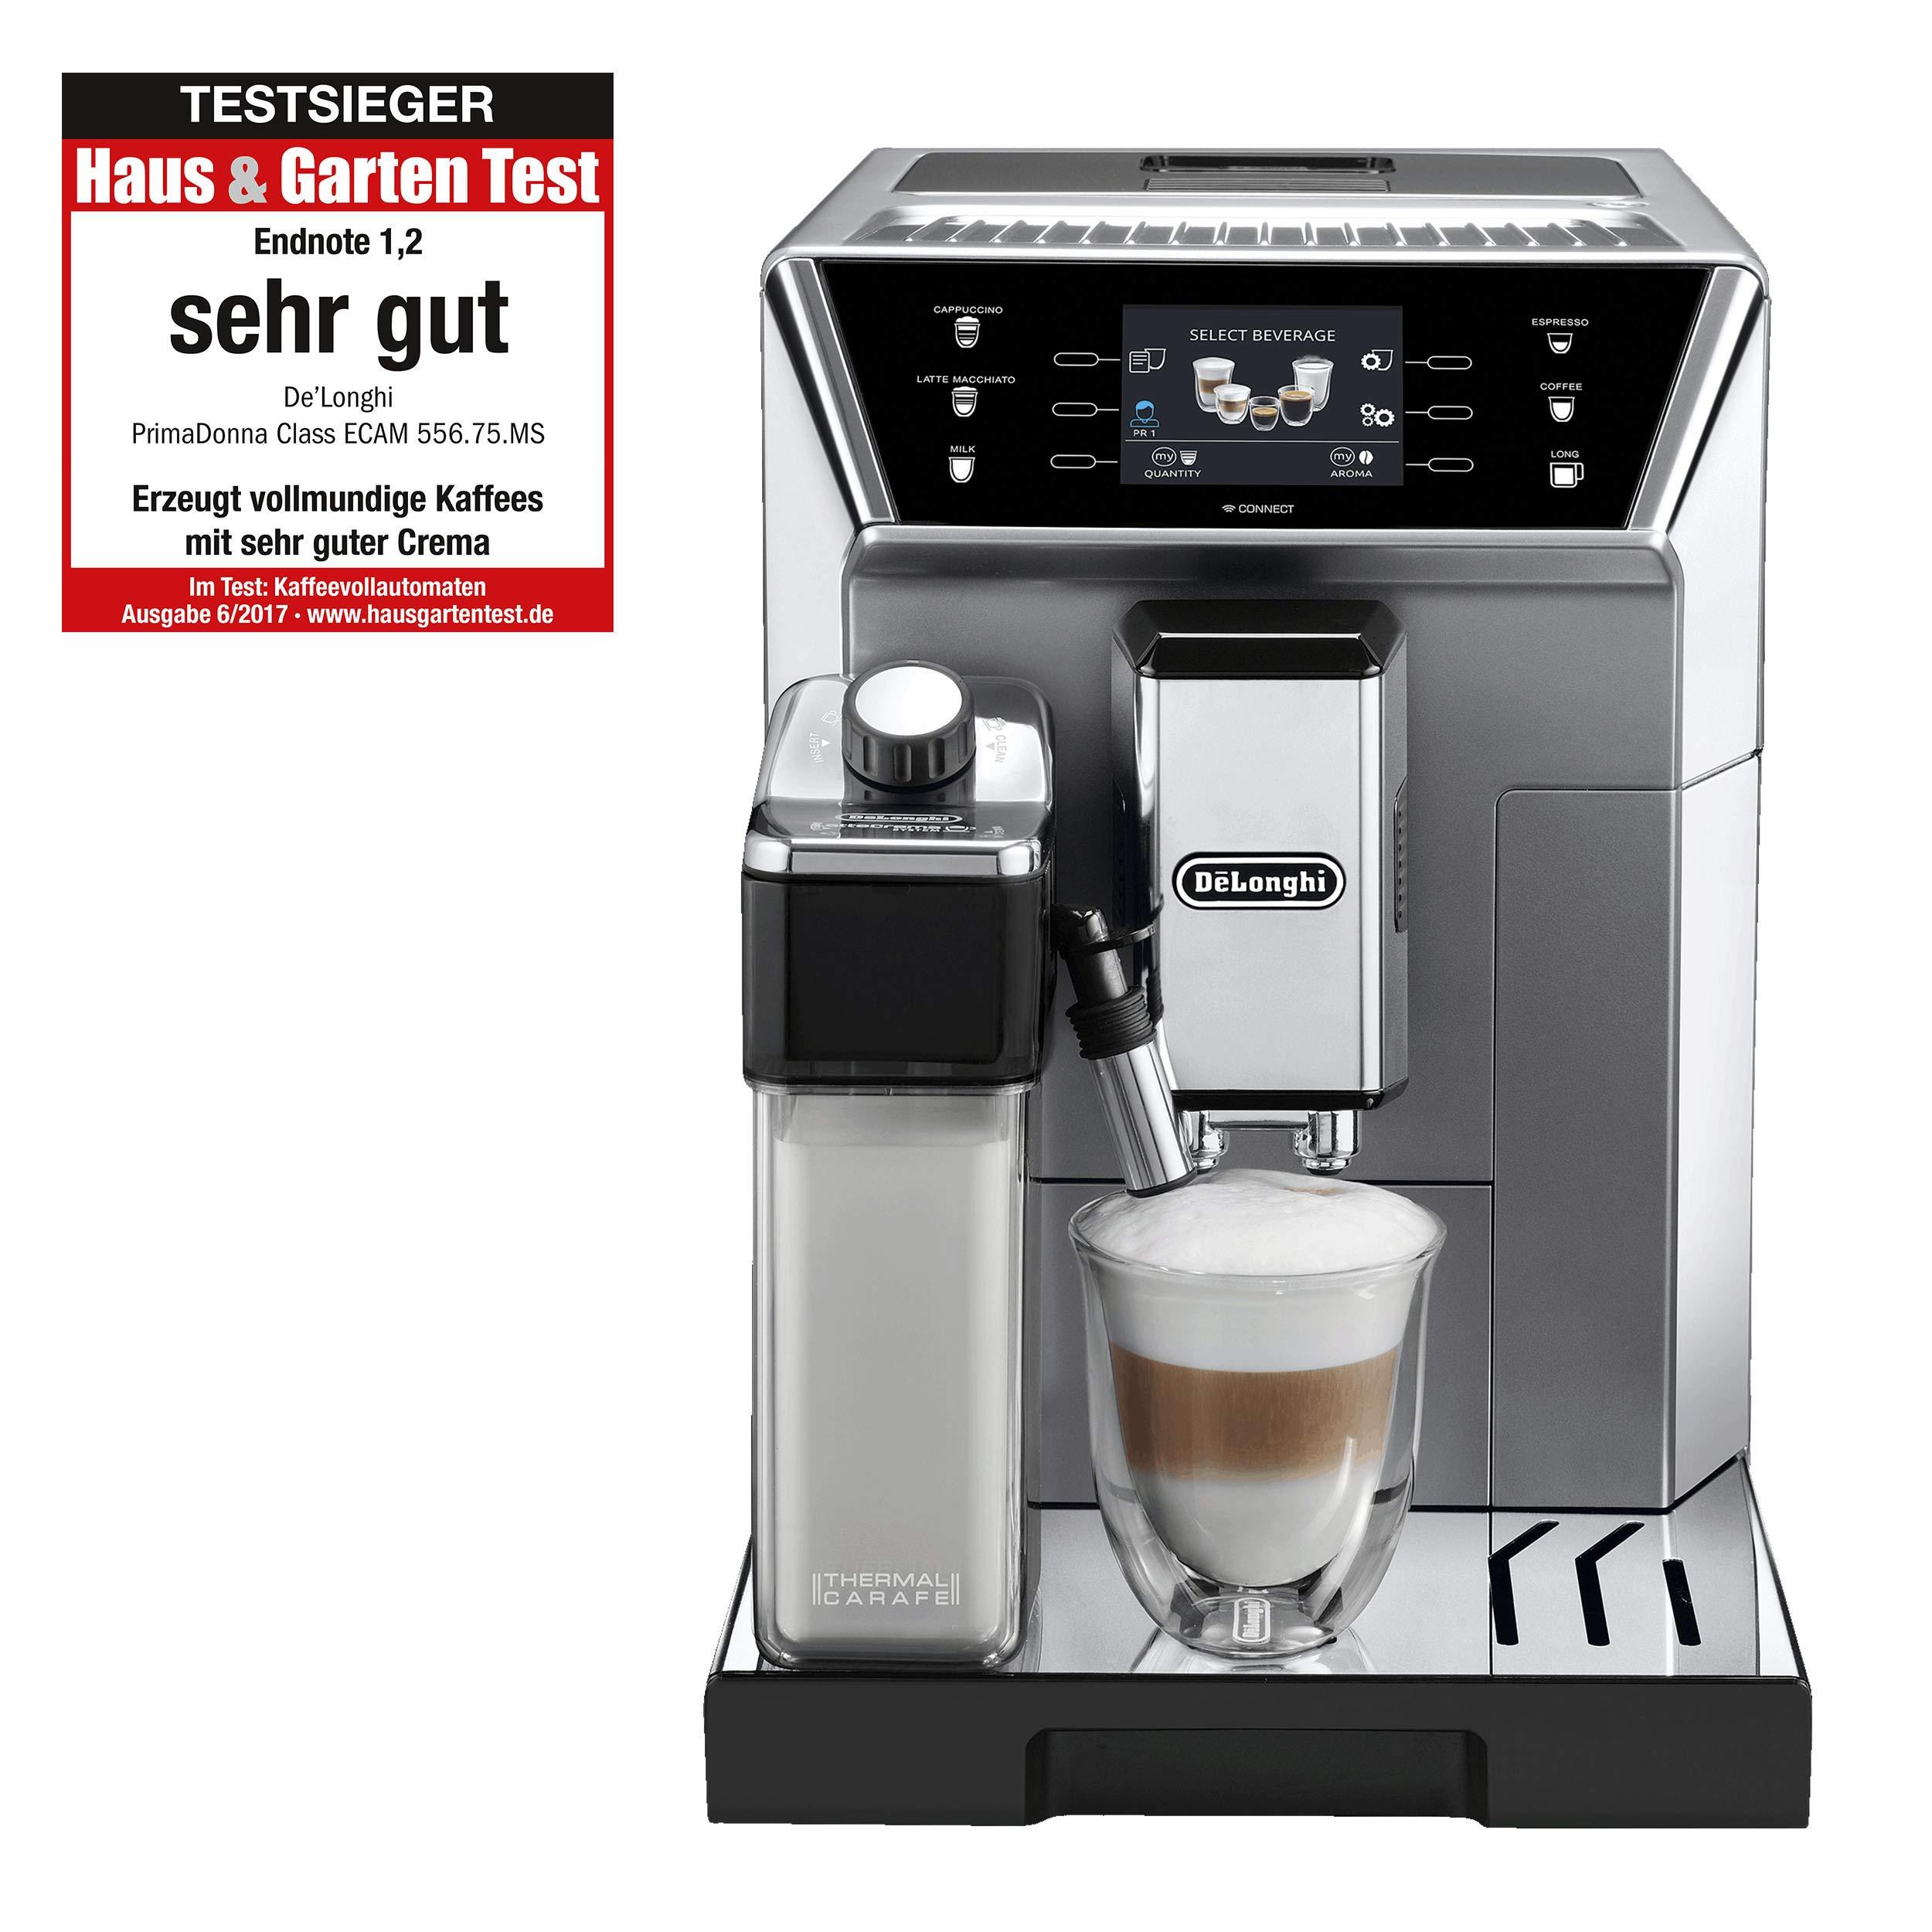 De'Longhi ECAM 556.75.MS PrimaDonna Class Kaffeevollautomat (App, Milchsystem)